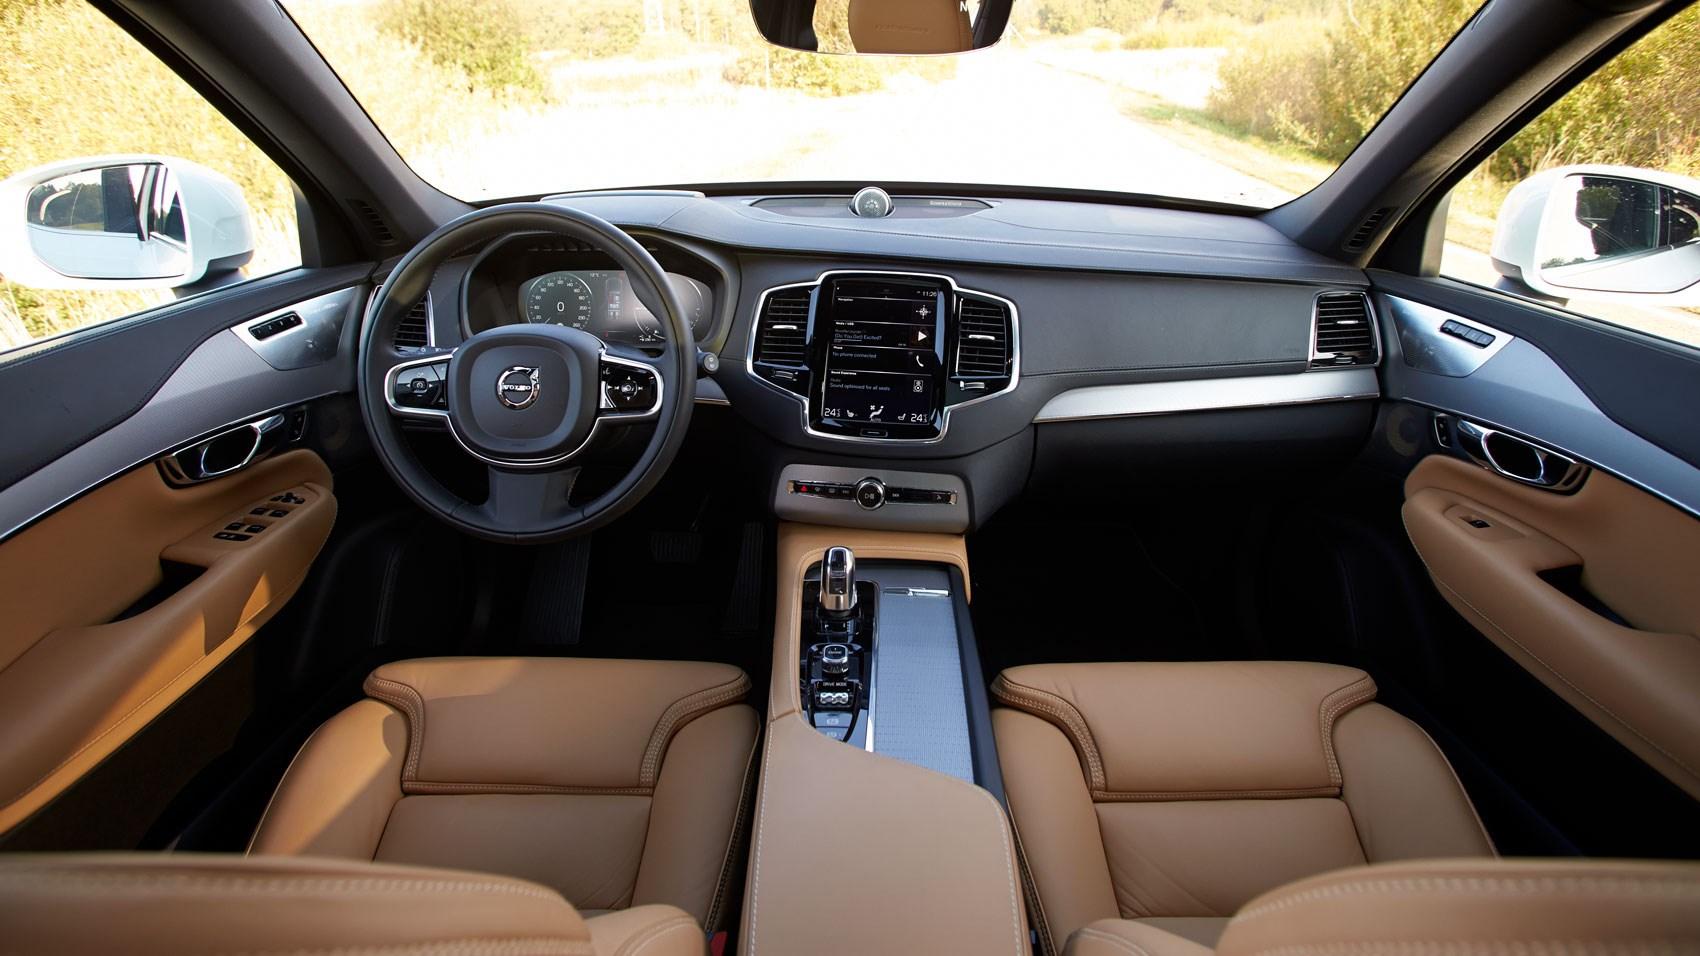 Volvo Xc90 T8 Twin Engine 2016 Review Car Magazine